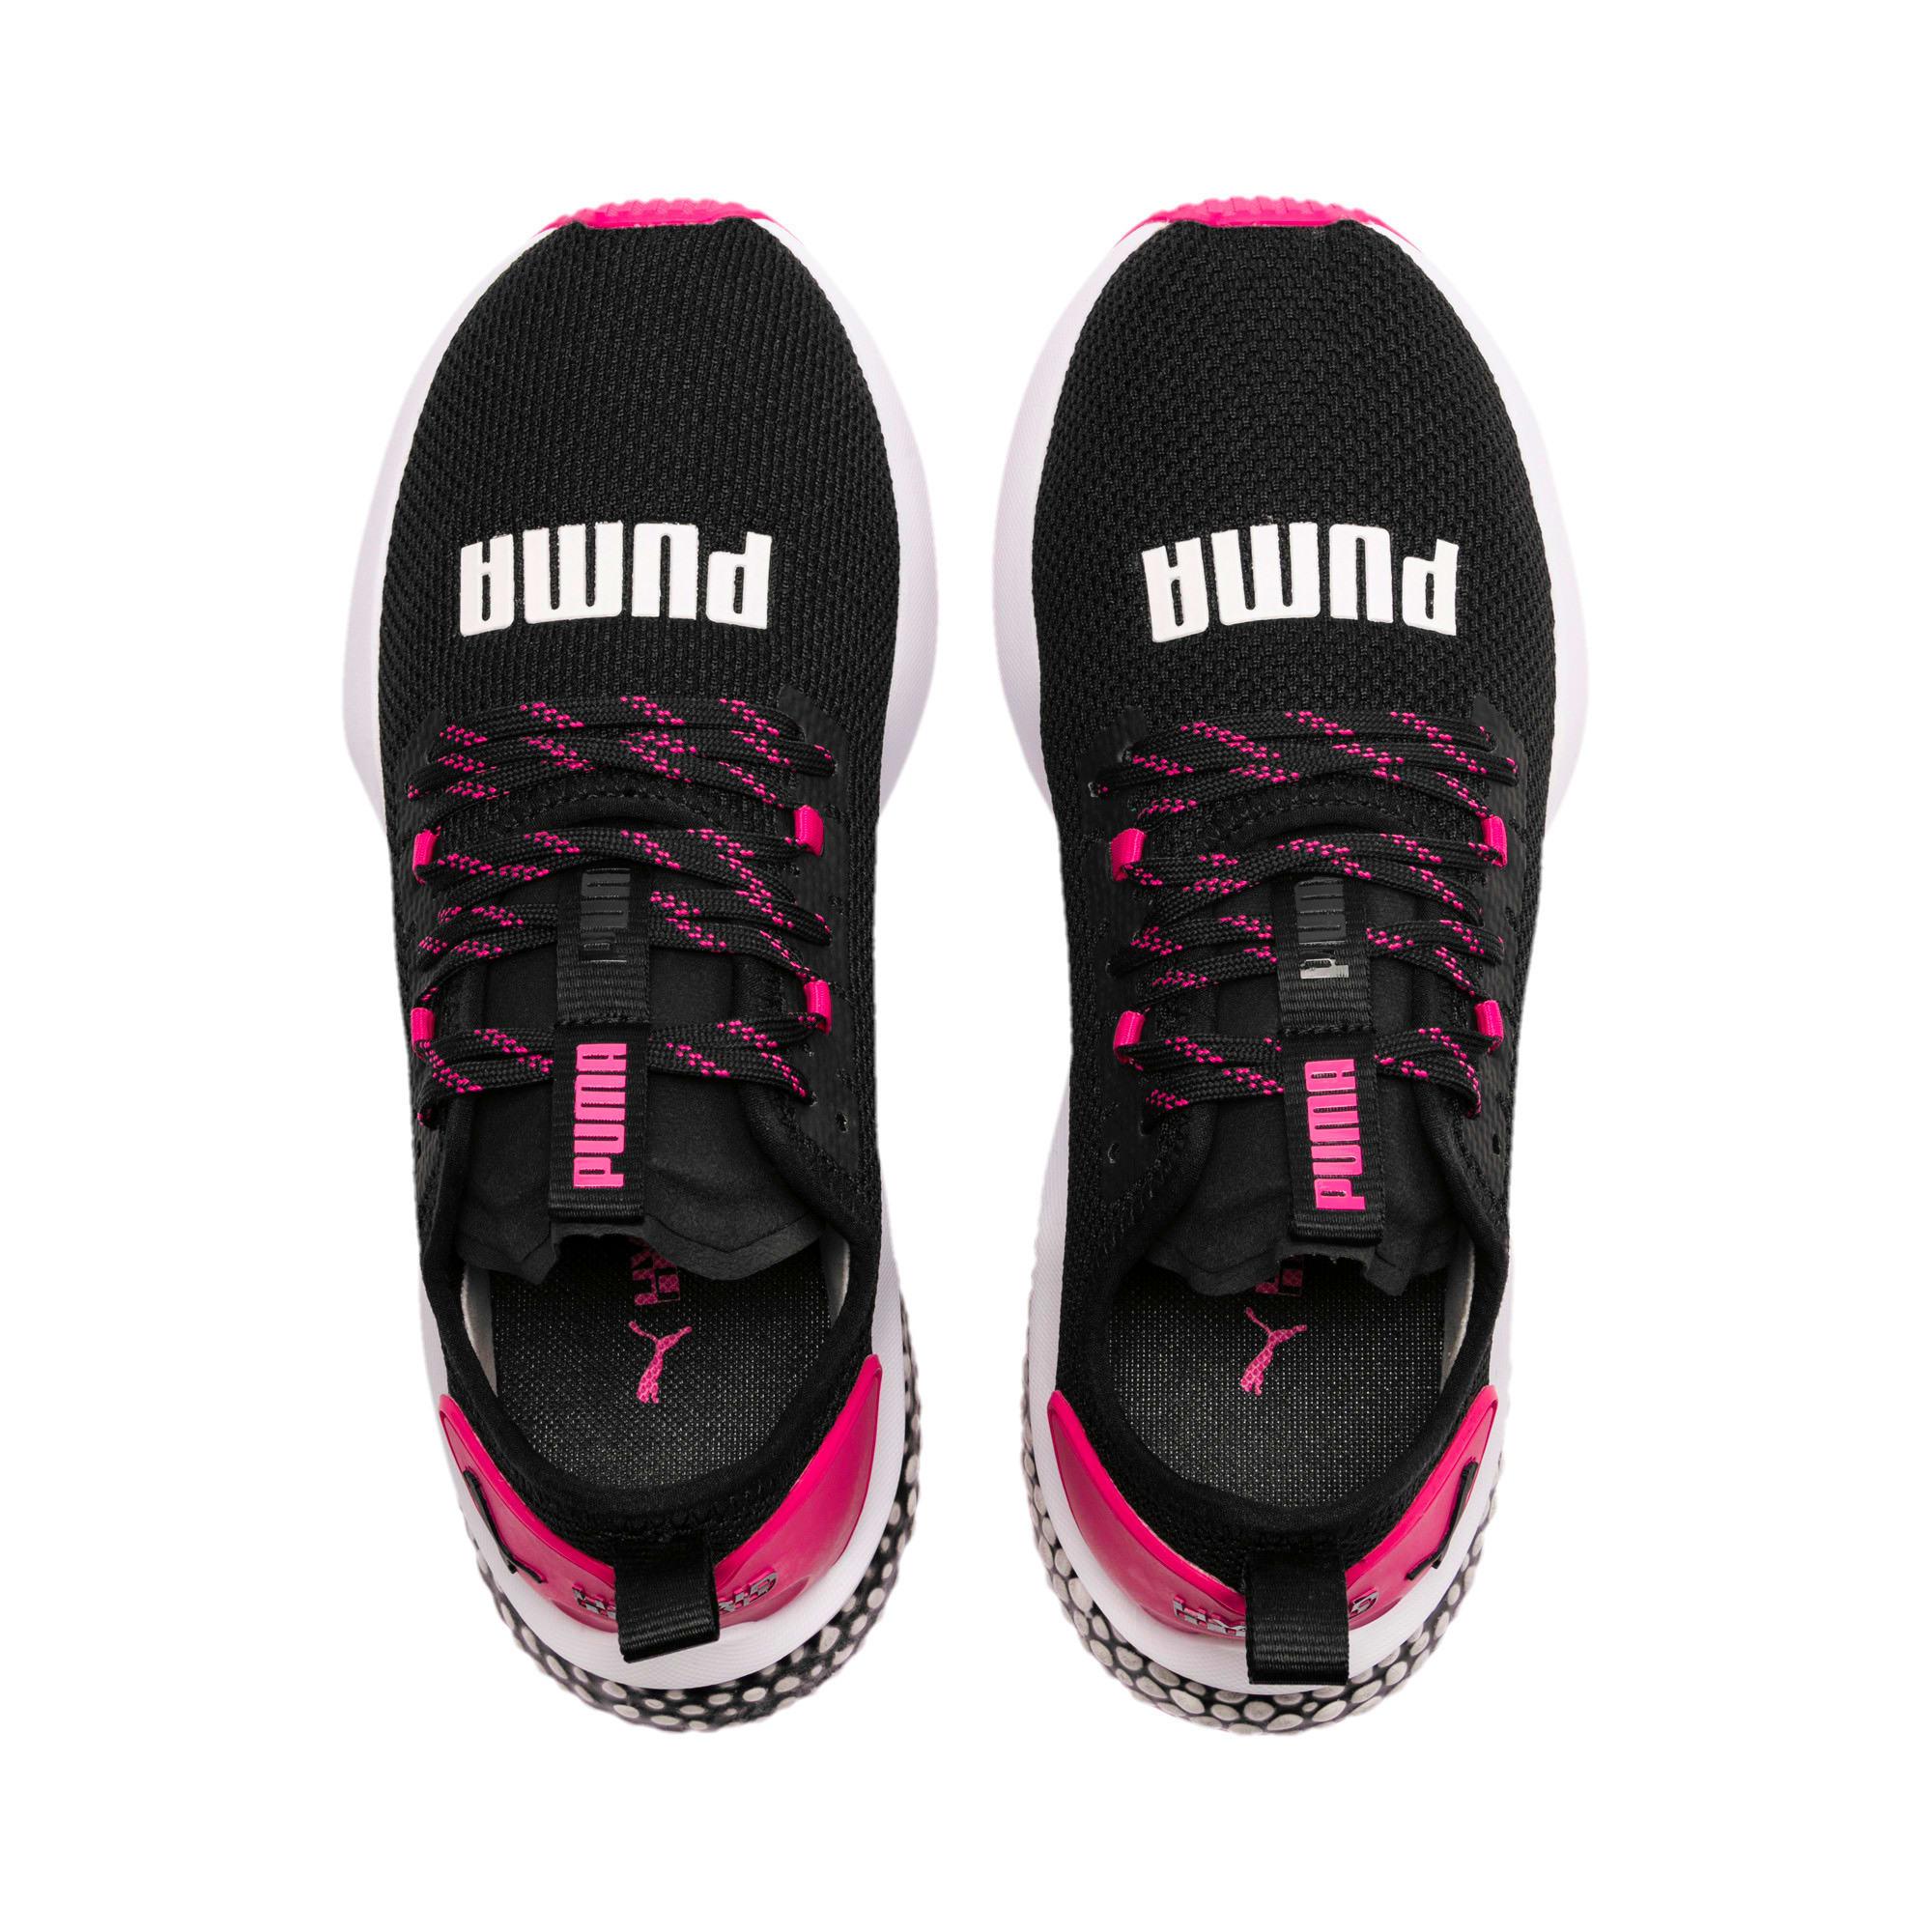 Thumbnail 7 of HYBRID NX hardloopschoenen voor dames, Puma Black-Fuchsia Purple, medium